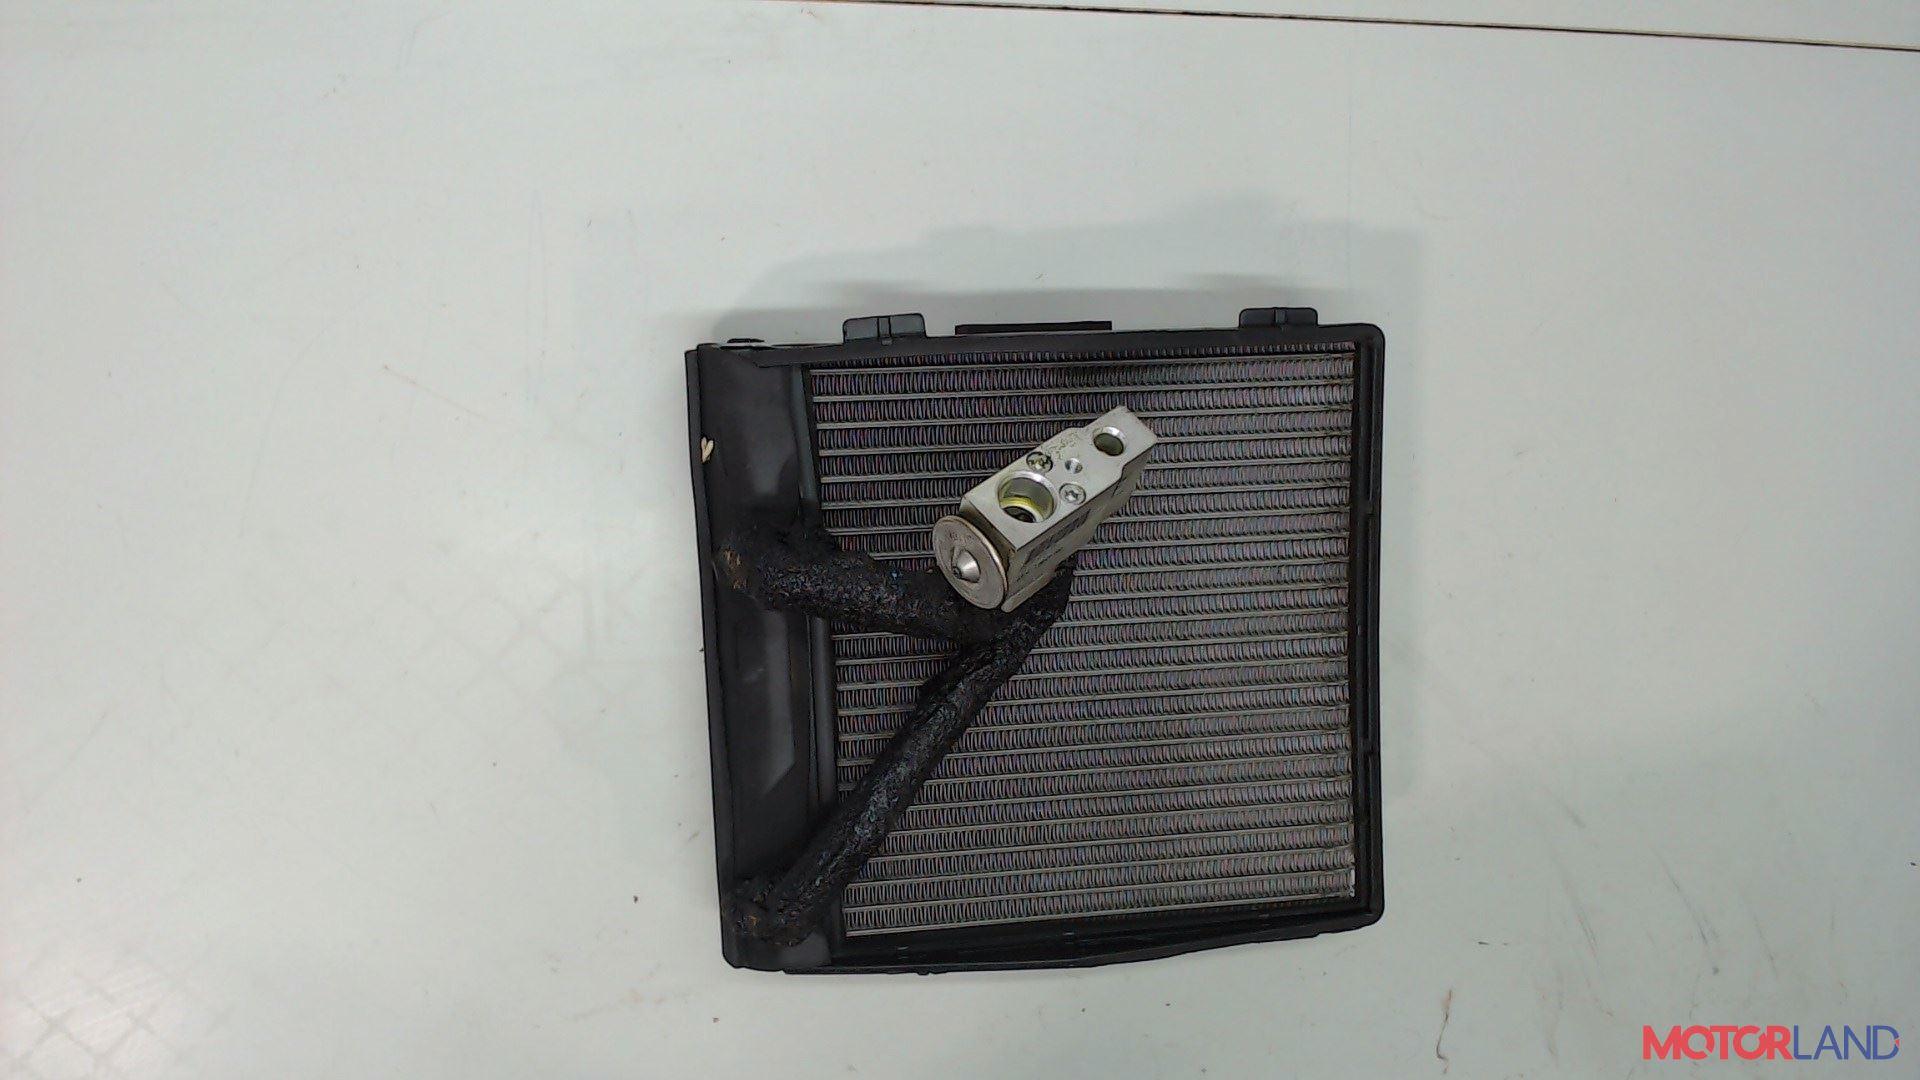 Радиатор кондиционера Infiniti QX56 (JA60) 2004-2010, [КонстрНомер-Артикул] #1